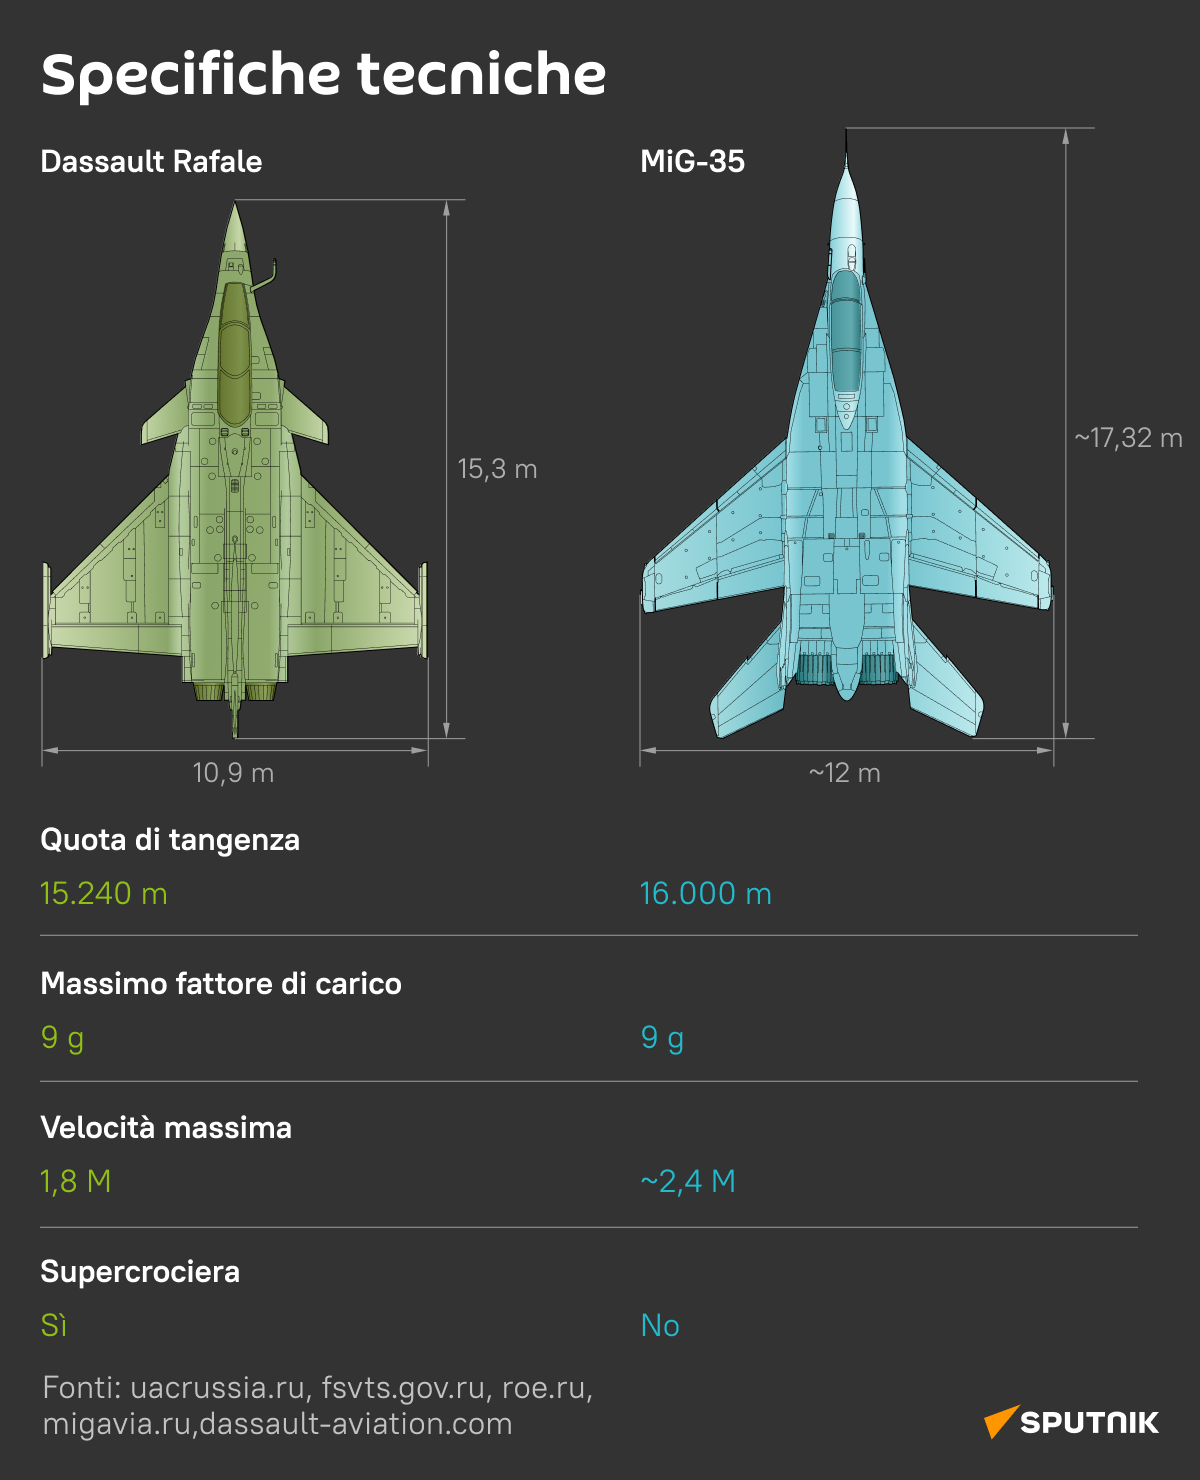 Il russo MiG-35 vs il francese Rafale 1 - Sputnik Italia